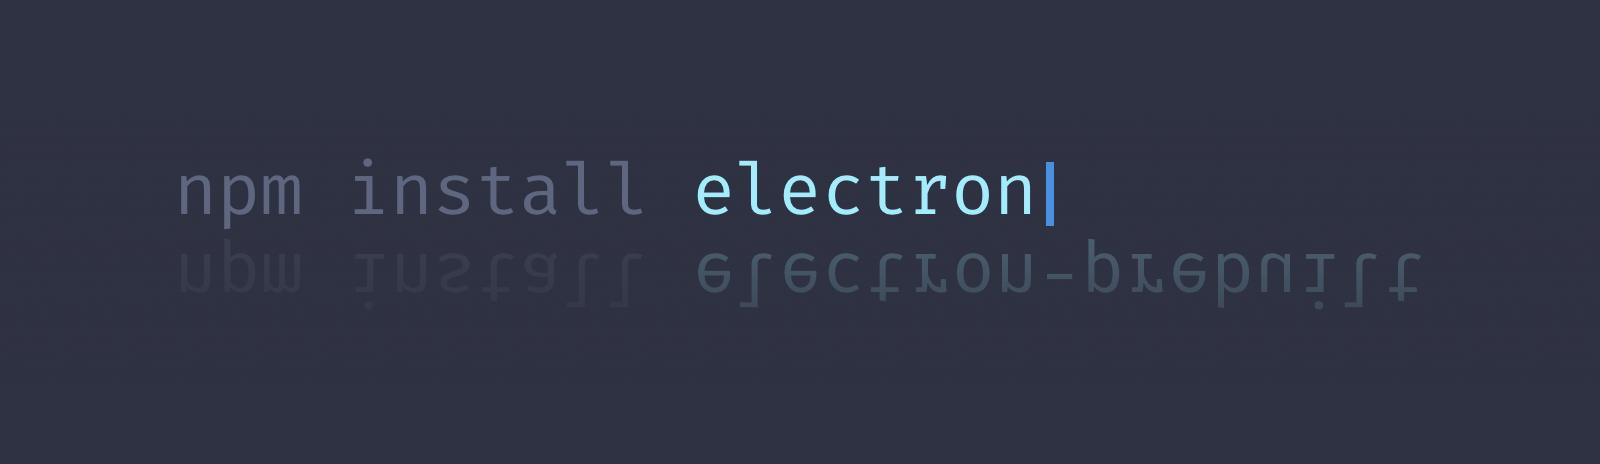 npm install electron